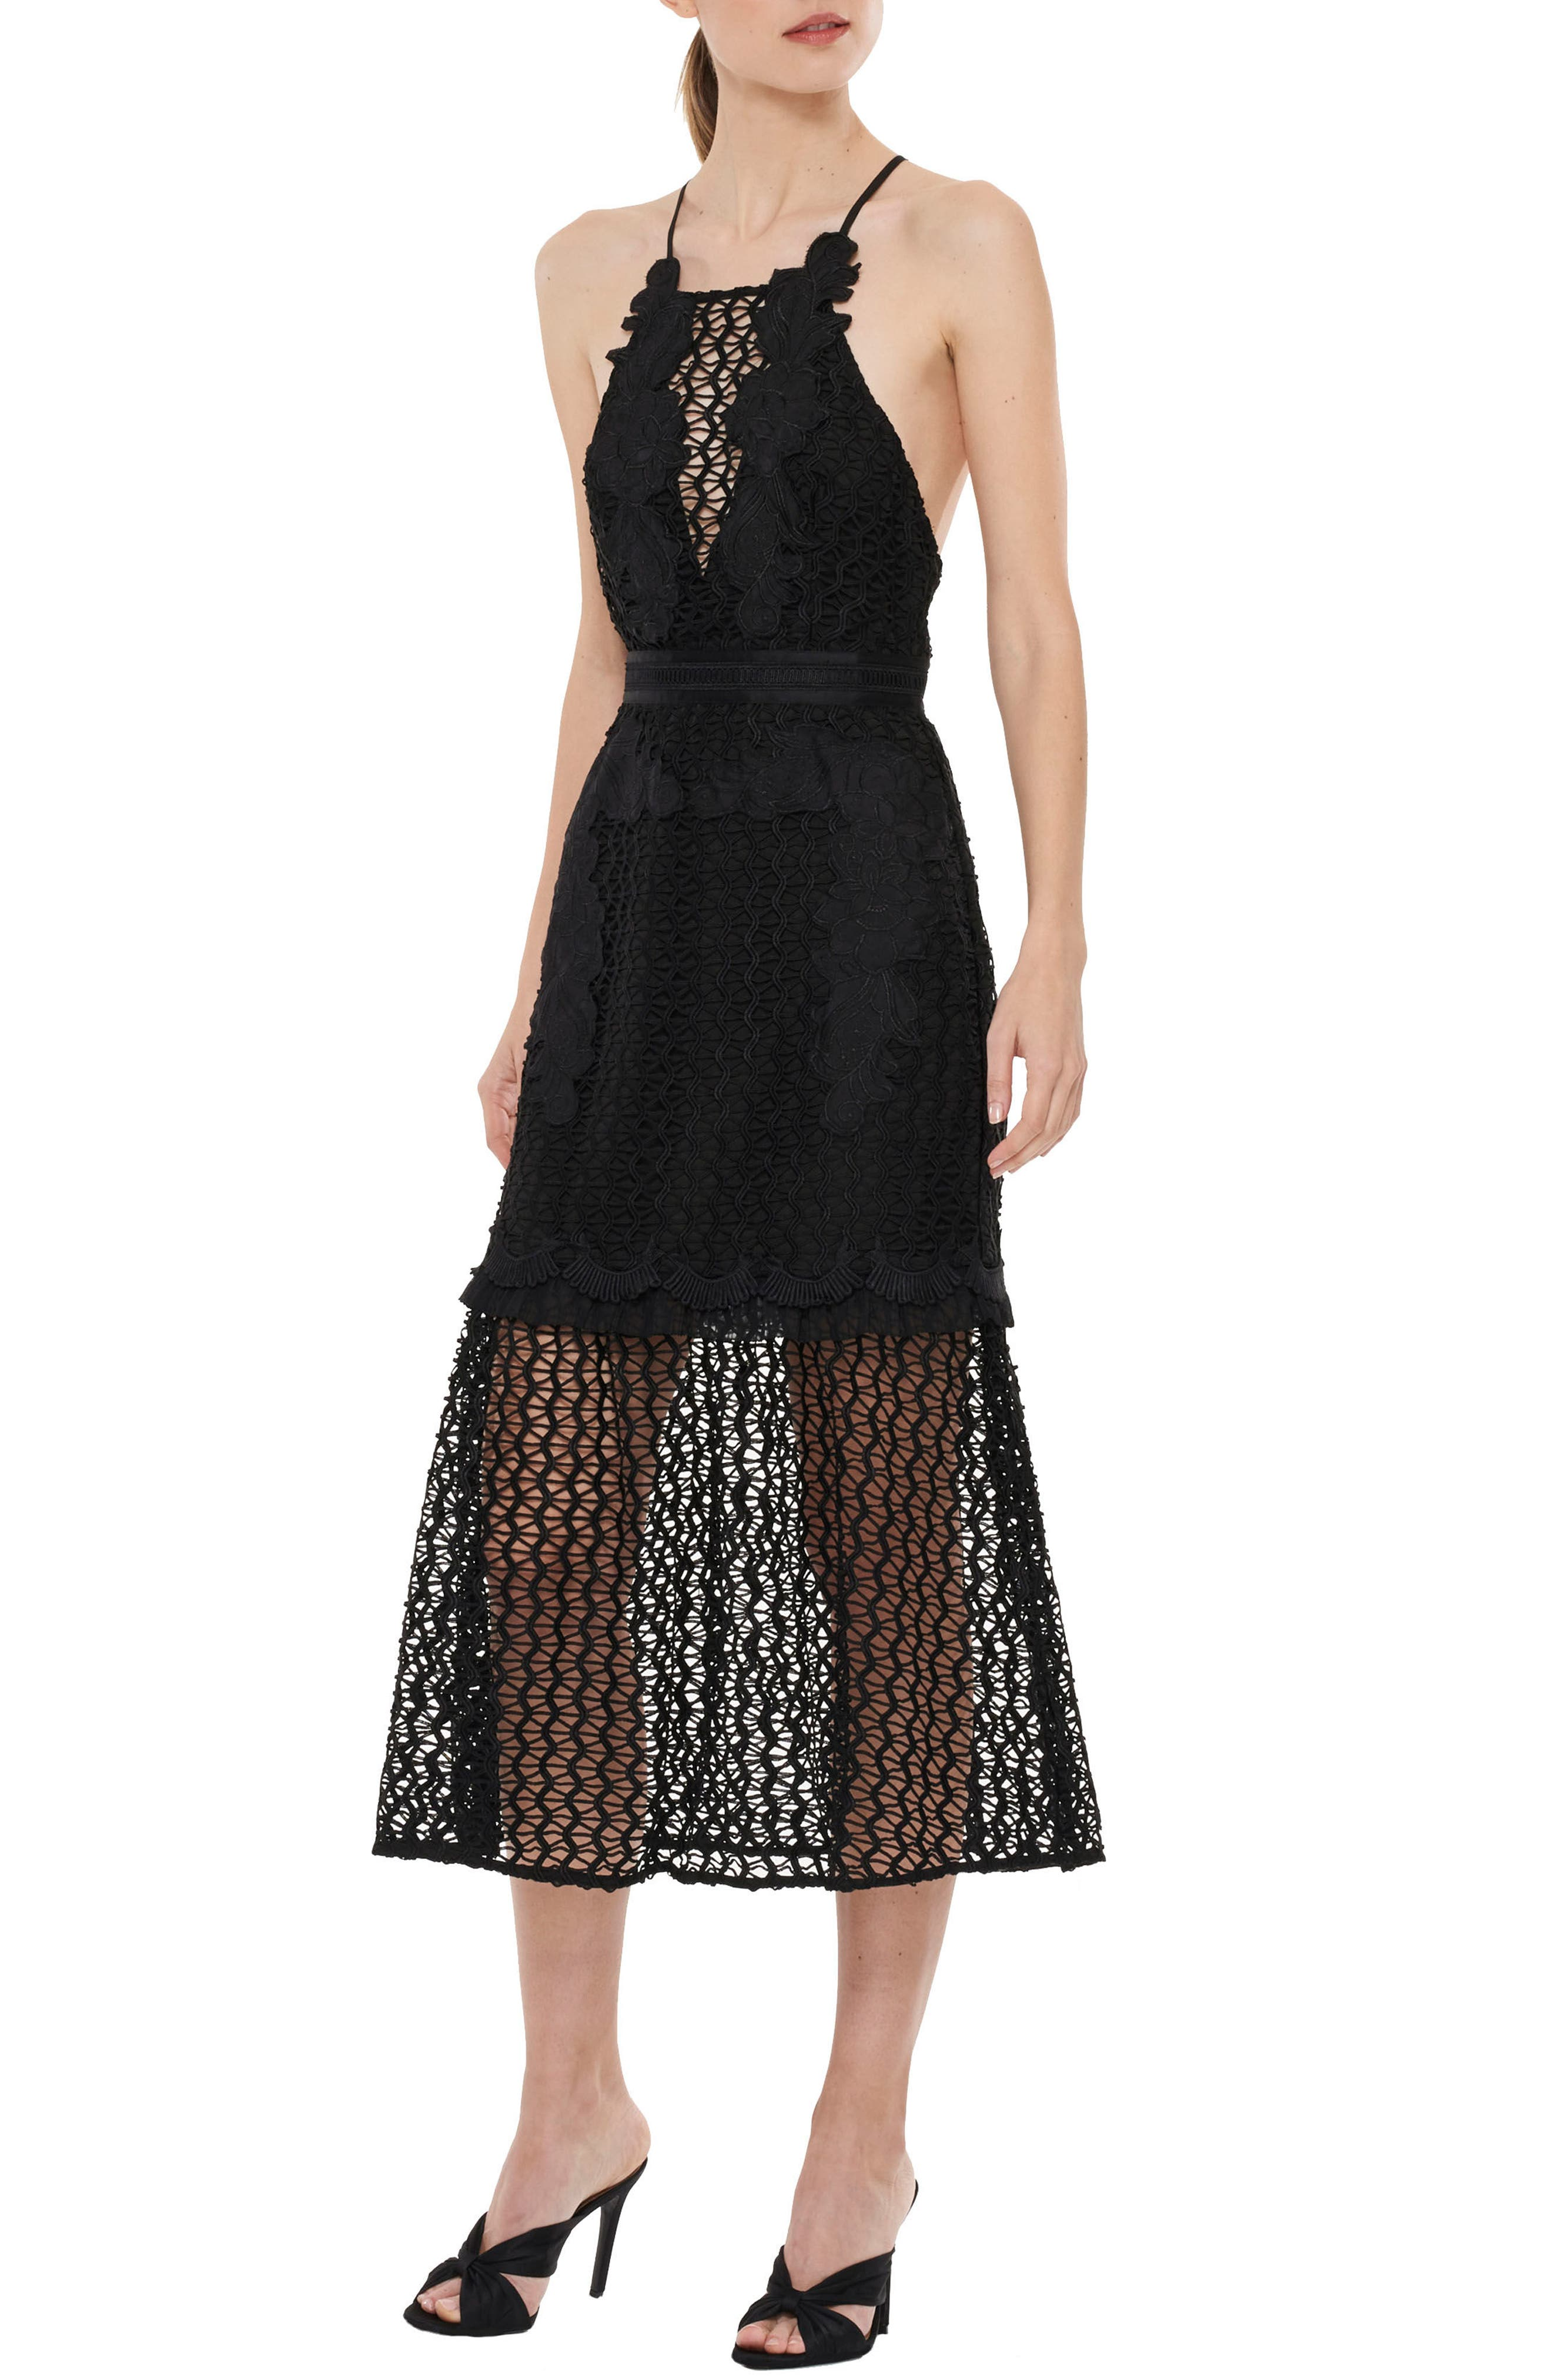 Sweet Dreams Crochet A-Line Dress,                             Alternate thumbnail 3, color,                             001